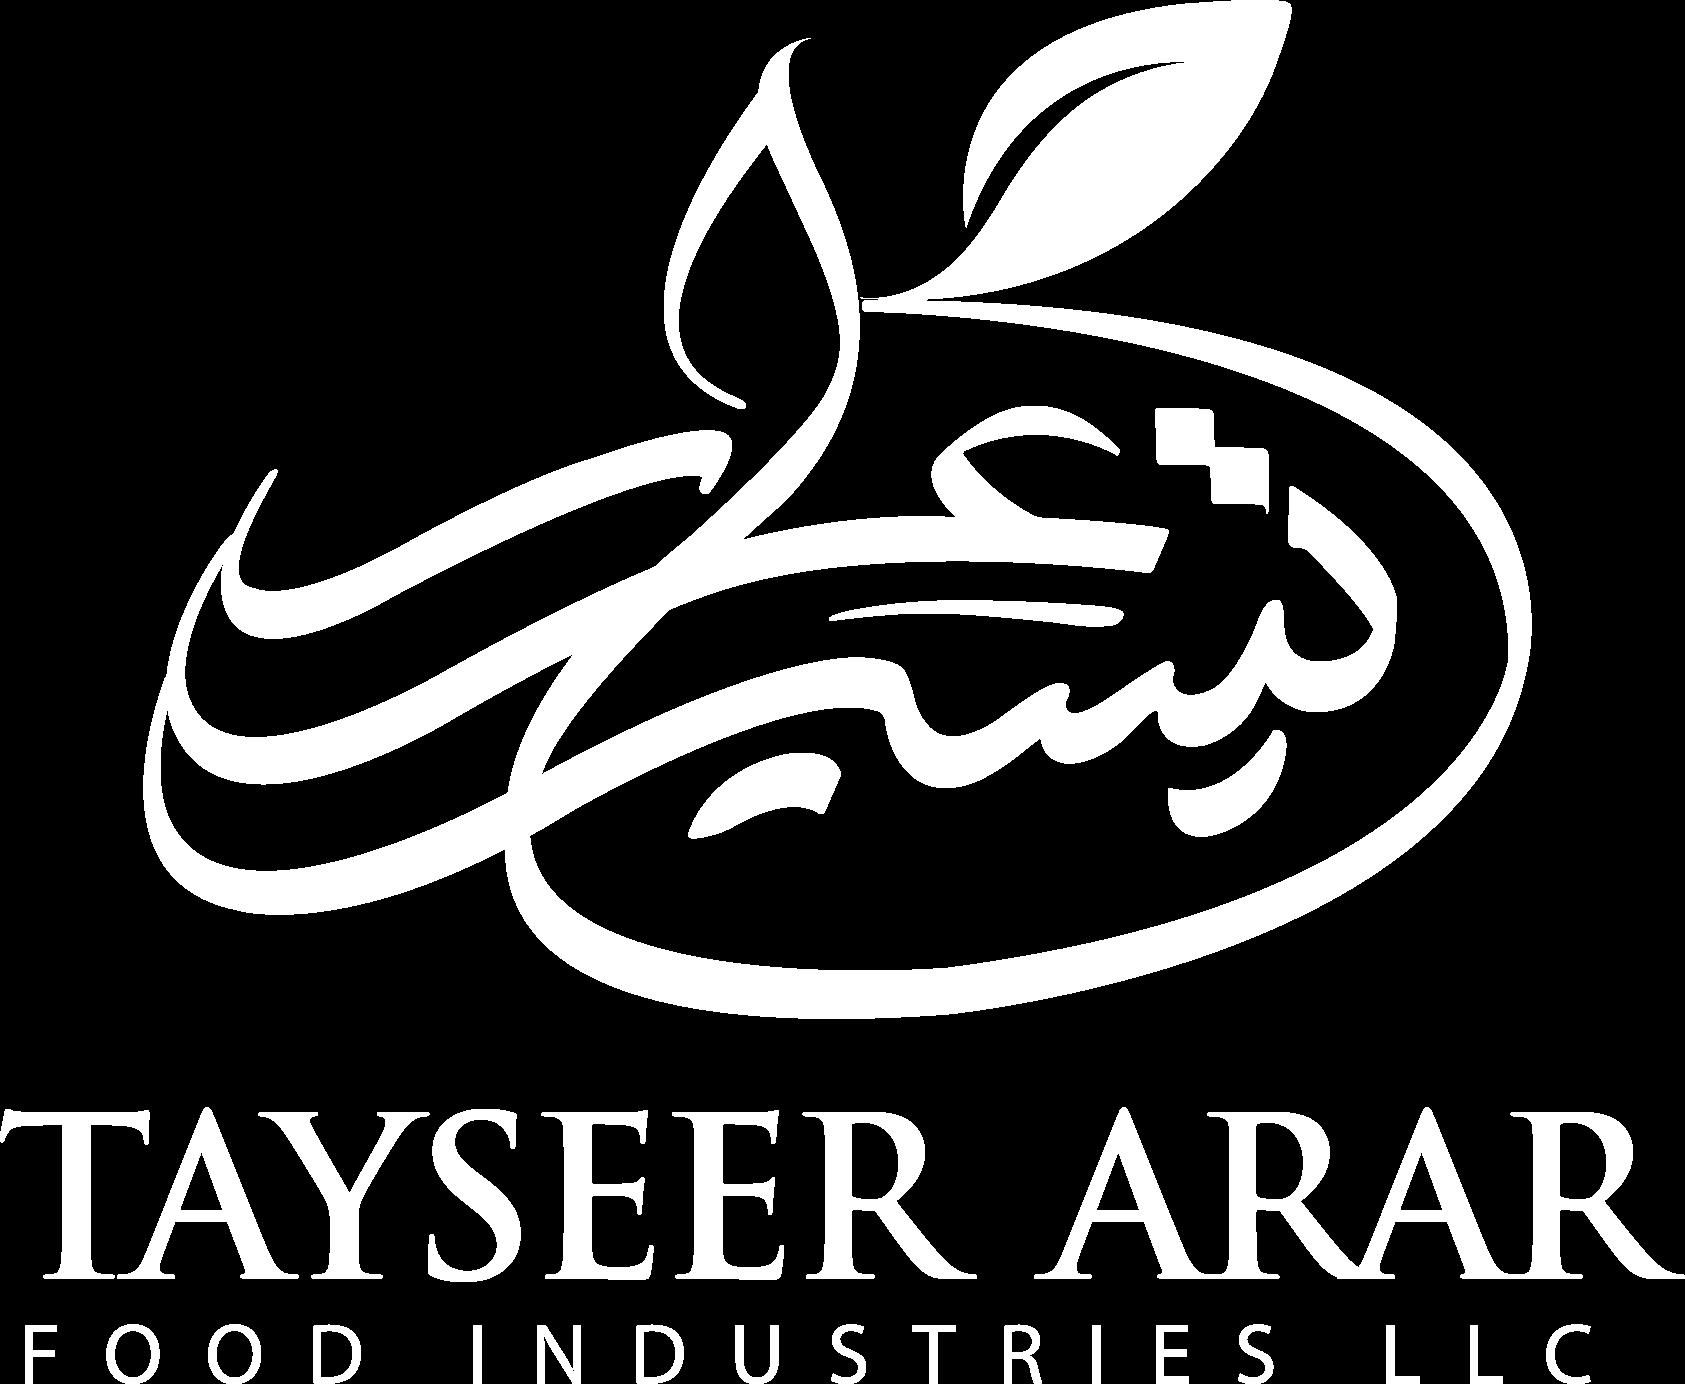 Tayseer Arar Food Industry